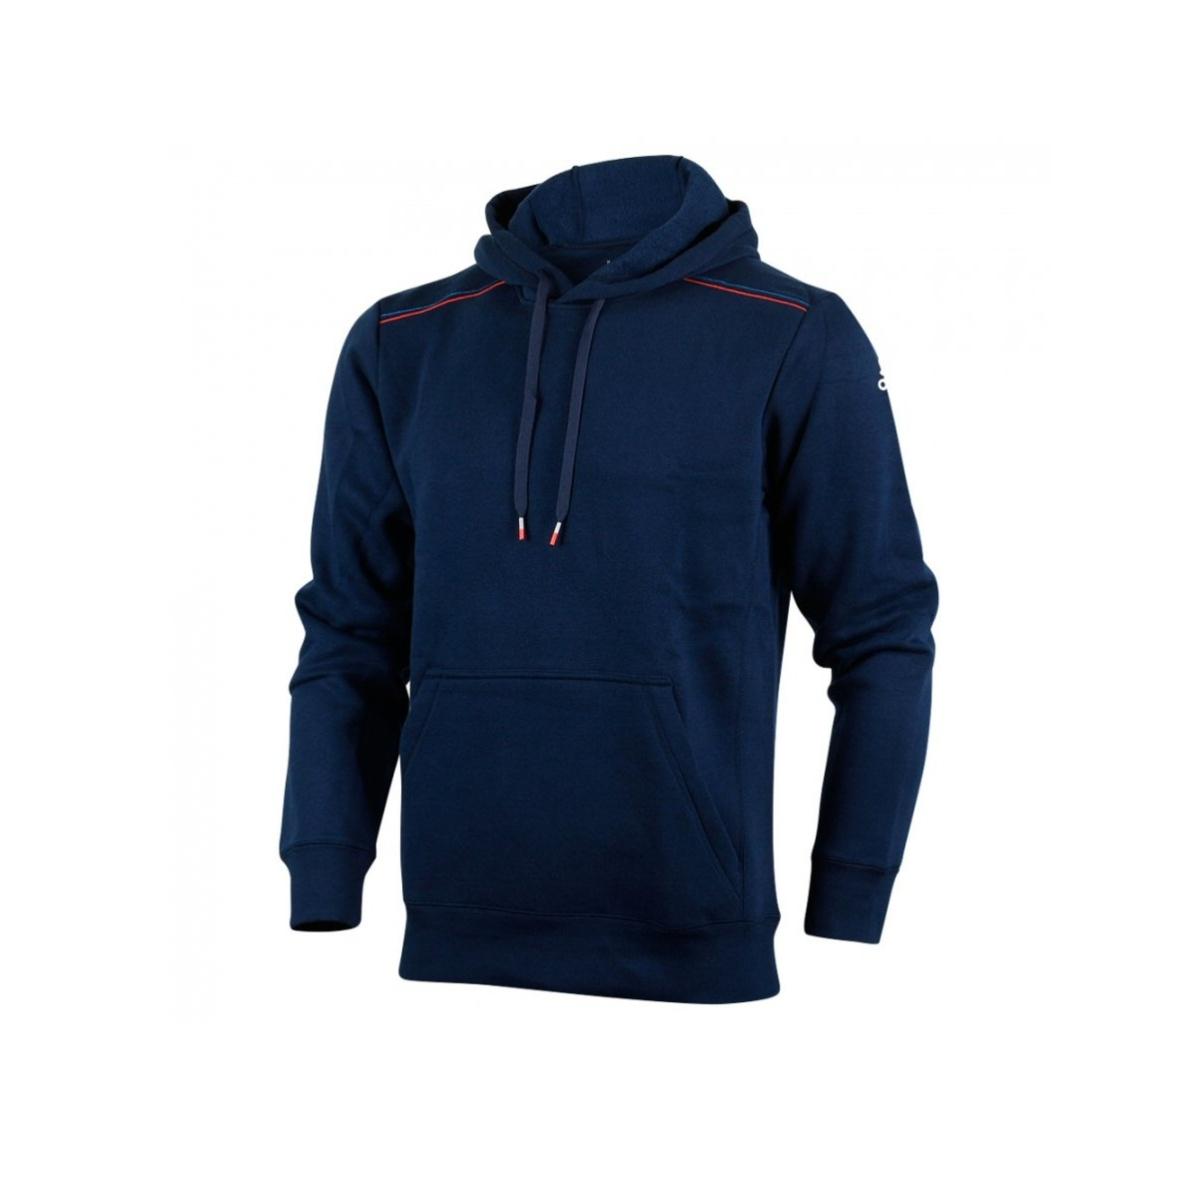 adidas hoodie ucl navy herren versandkostenfrei online. Black Bedroom Furniture Sets. Home Design Ideas